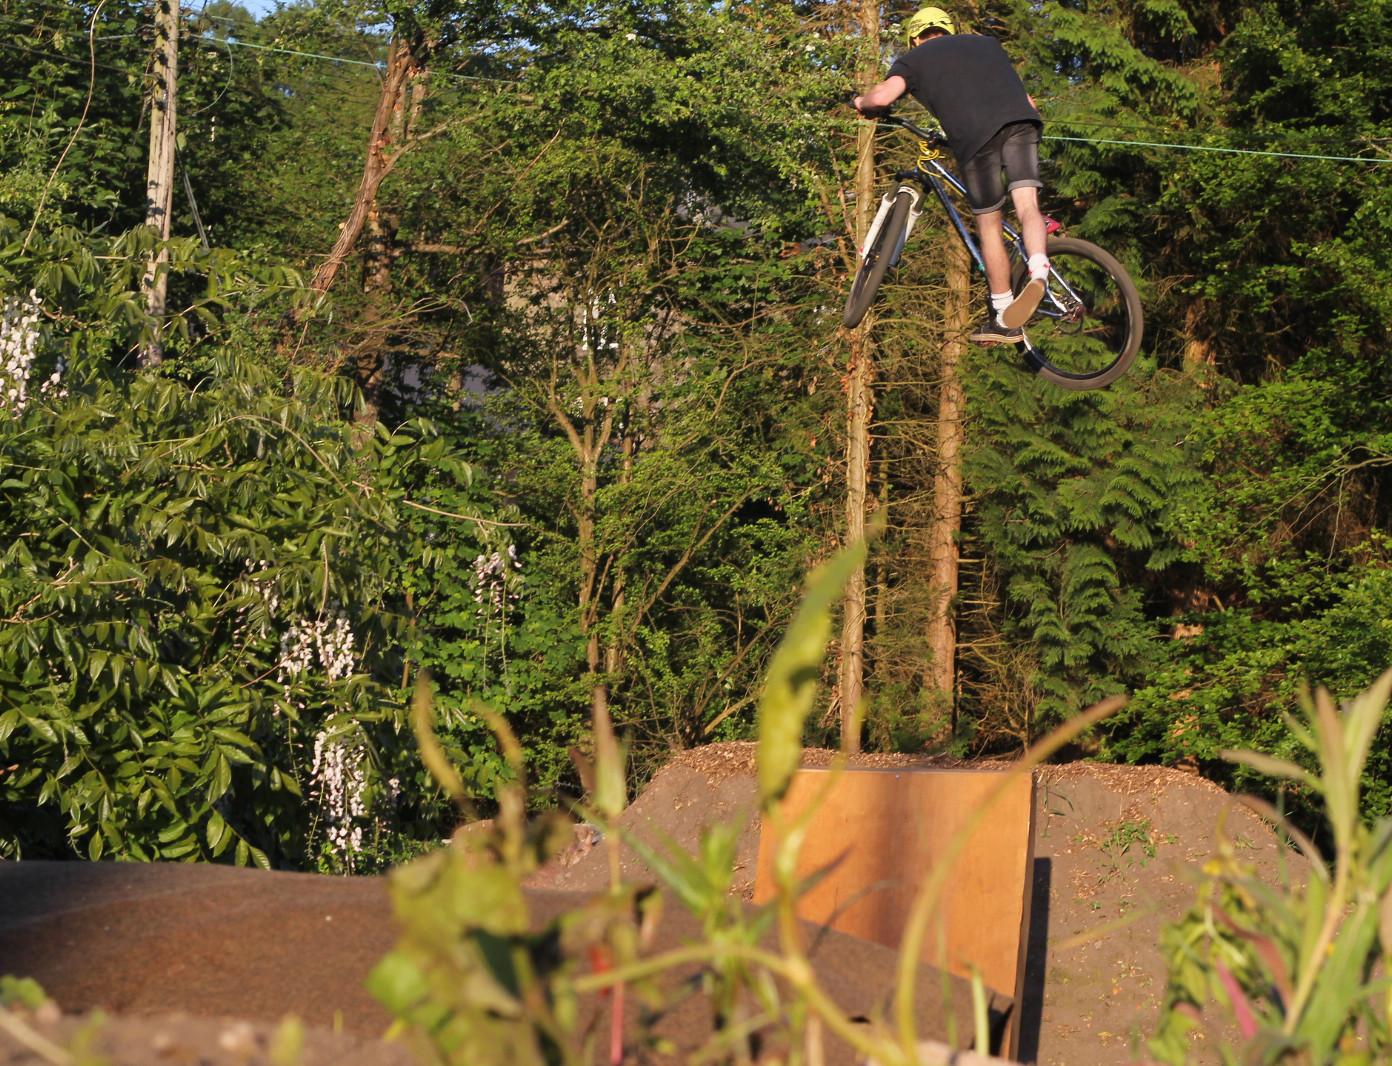 IMG 0036 - Matt_Aldridge - Mountain Biking Pictures - Vital MTB